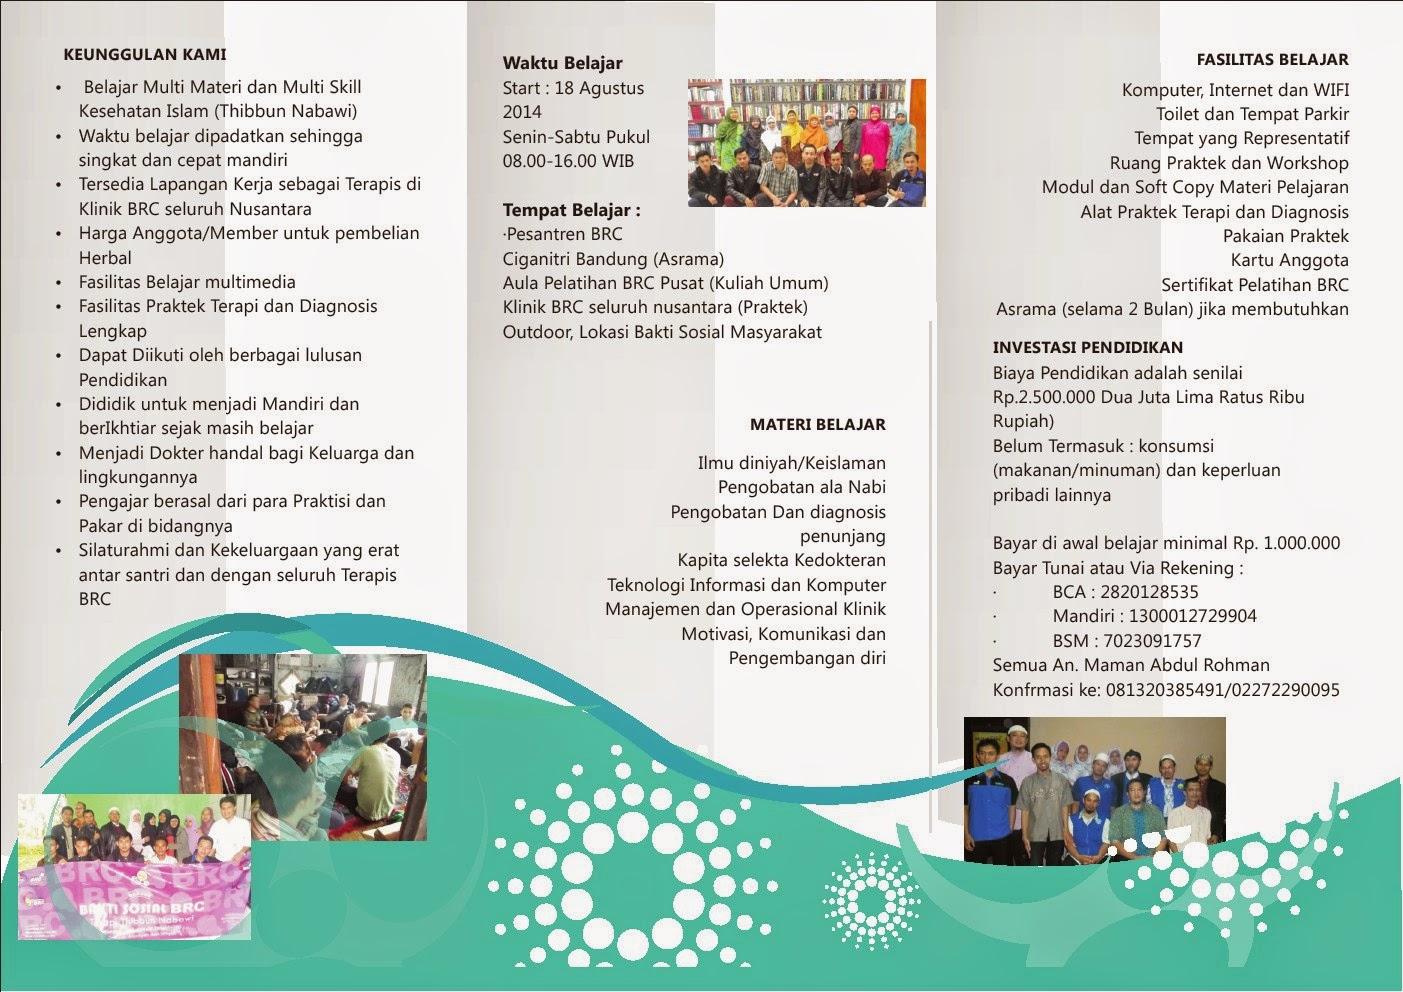 Download Mp3 Pengobatan Ruqyah Syar'iyyah Indramayu Majalengka Kuningan